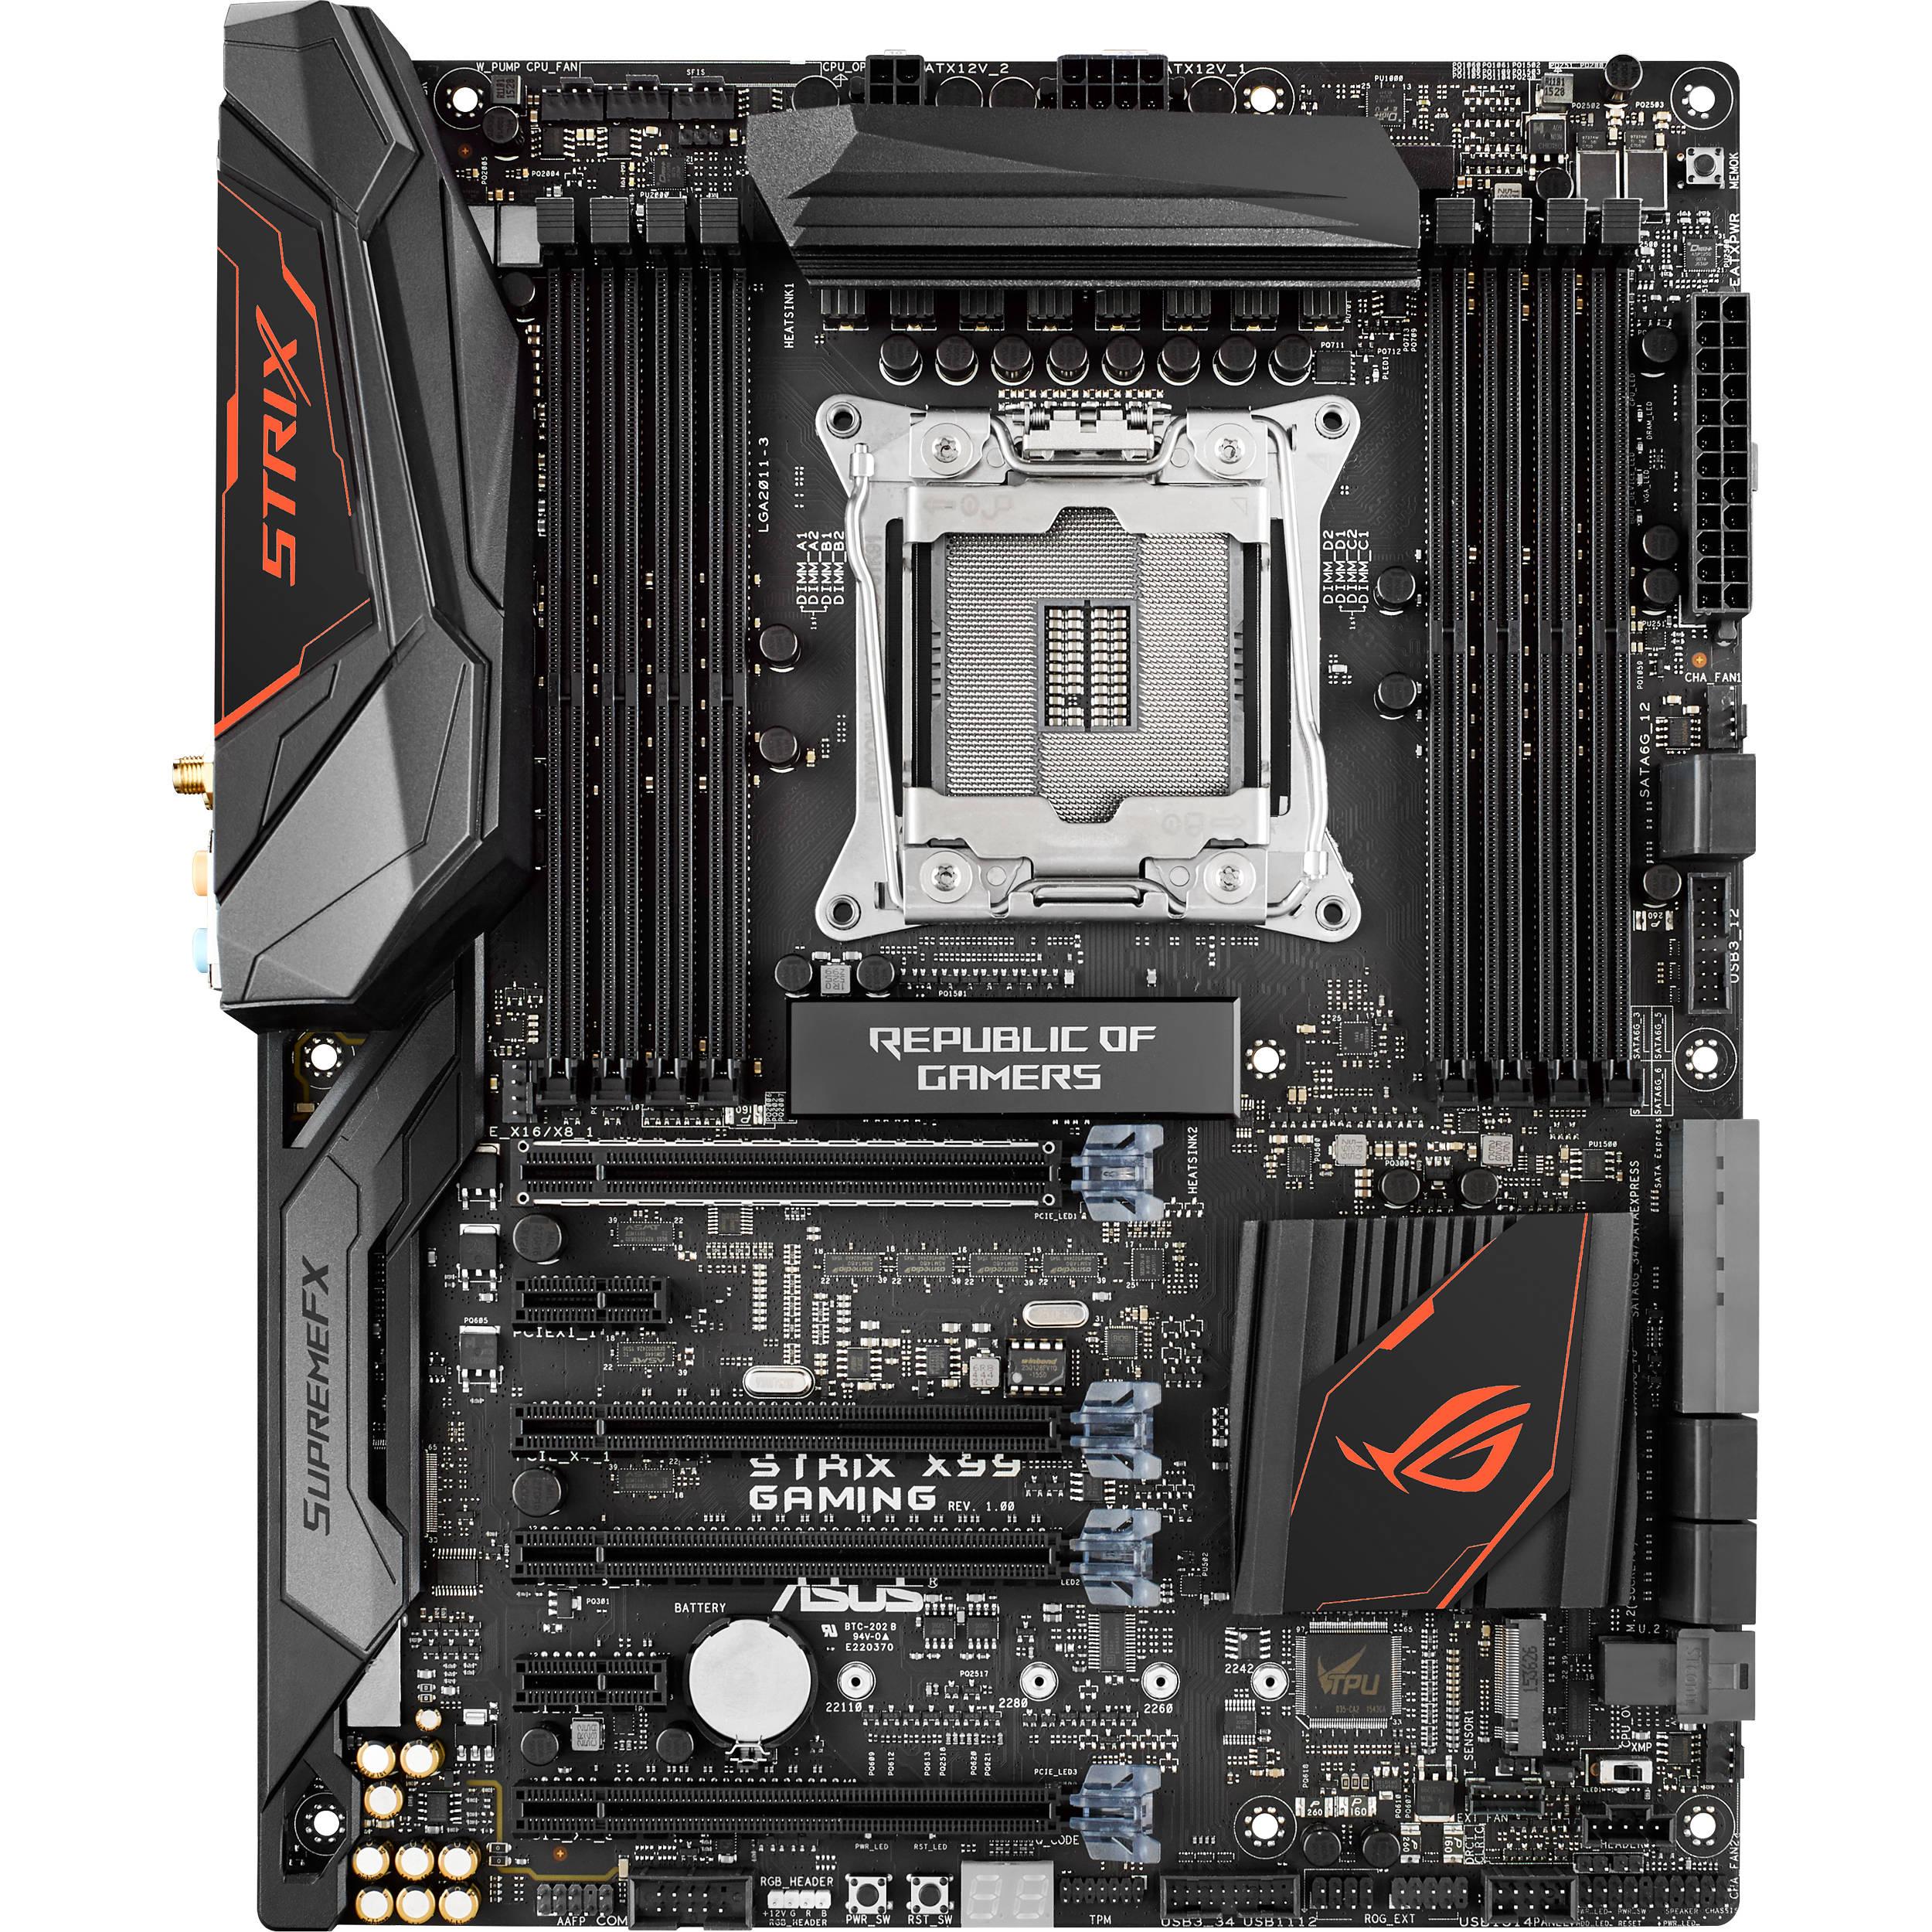 ROG STRIX X99 GAMING Desktop Motherboard - Intel Chipset - Socket LGA 2011-v3 $16